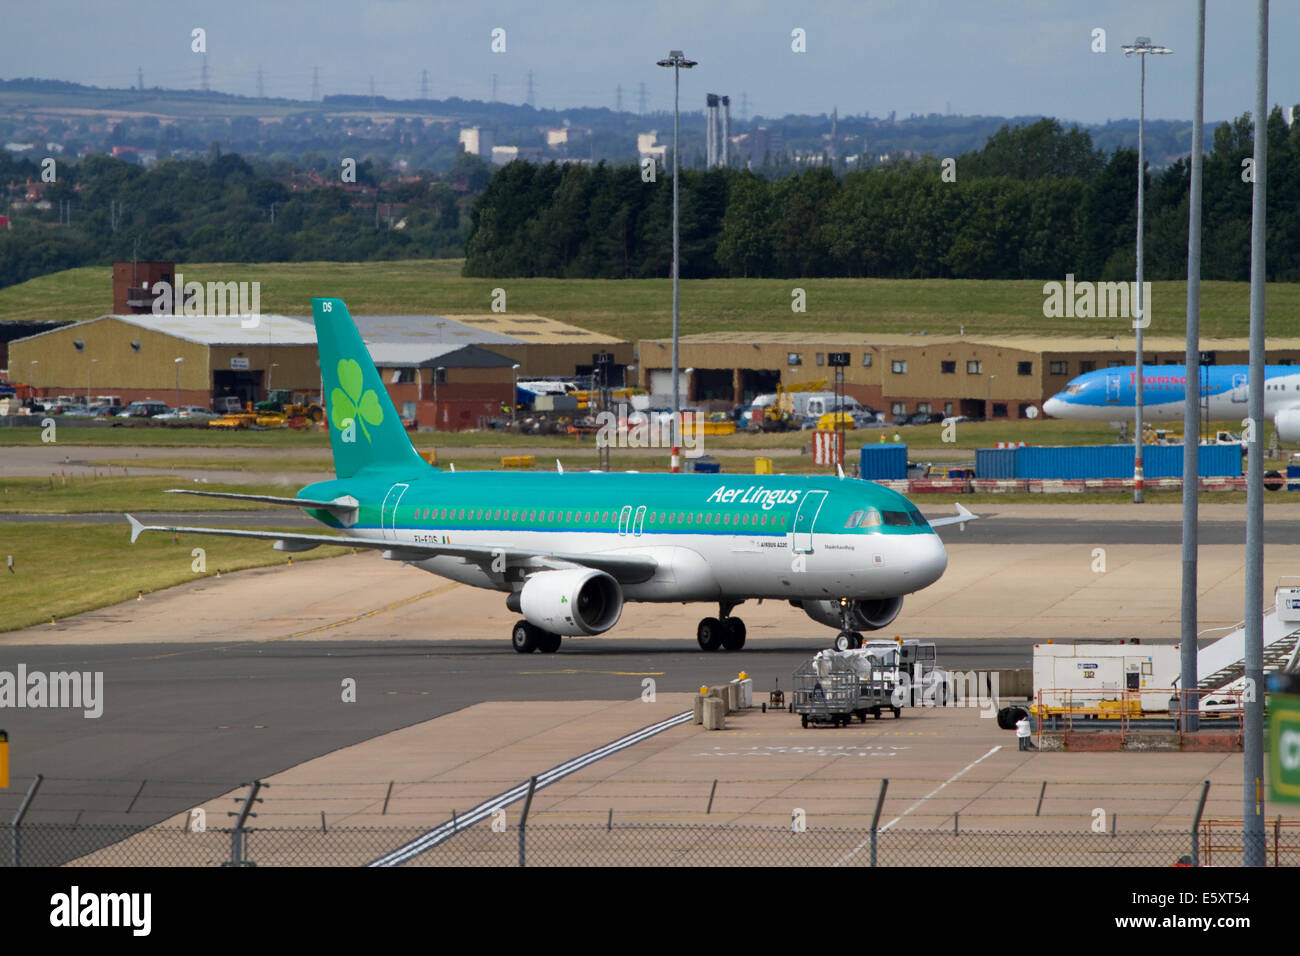 Aer Lingus Airliner de rodadura. Aeropuerto de Birmingham Imagen De Stock